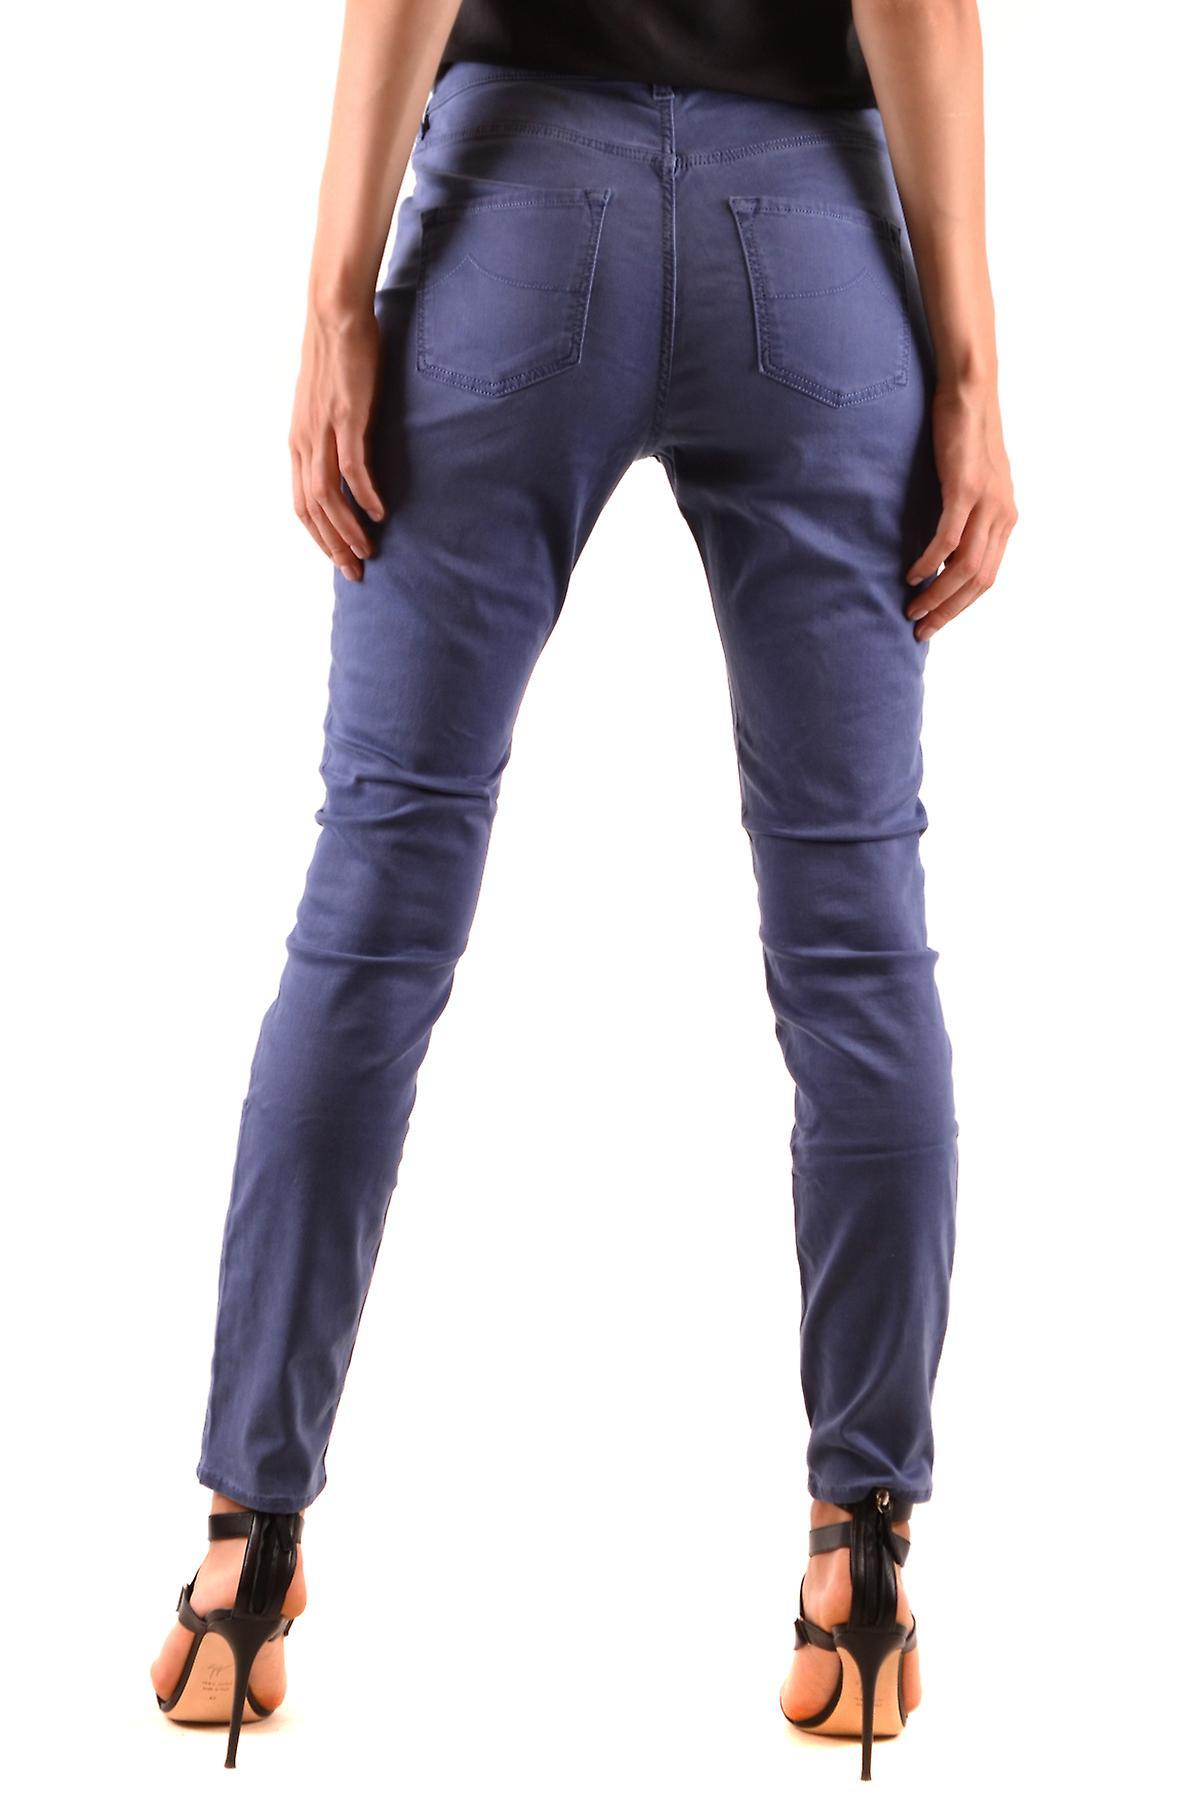 Jacob Cohen Ezbc054351 Femmes-apos;s Jeans denim pourpre e36IOo